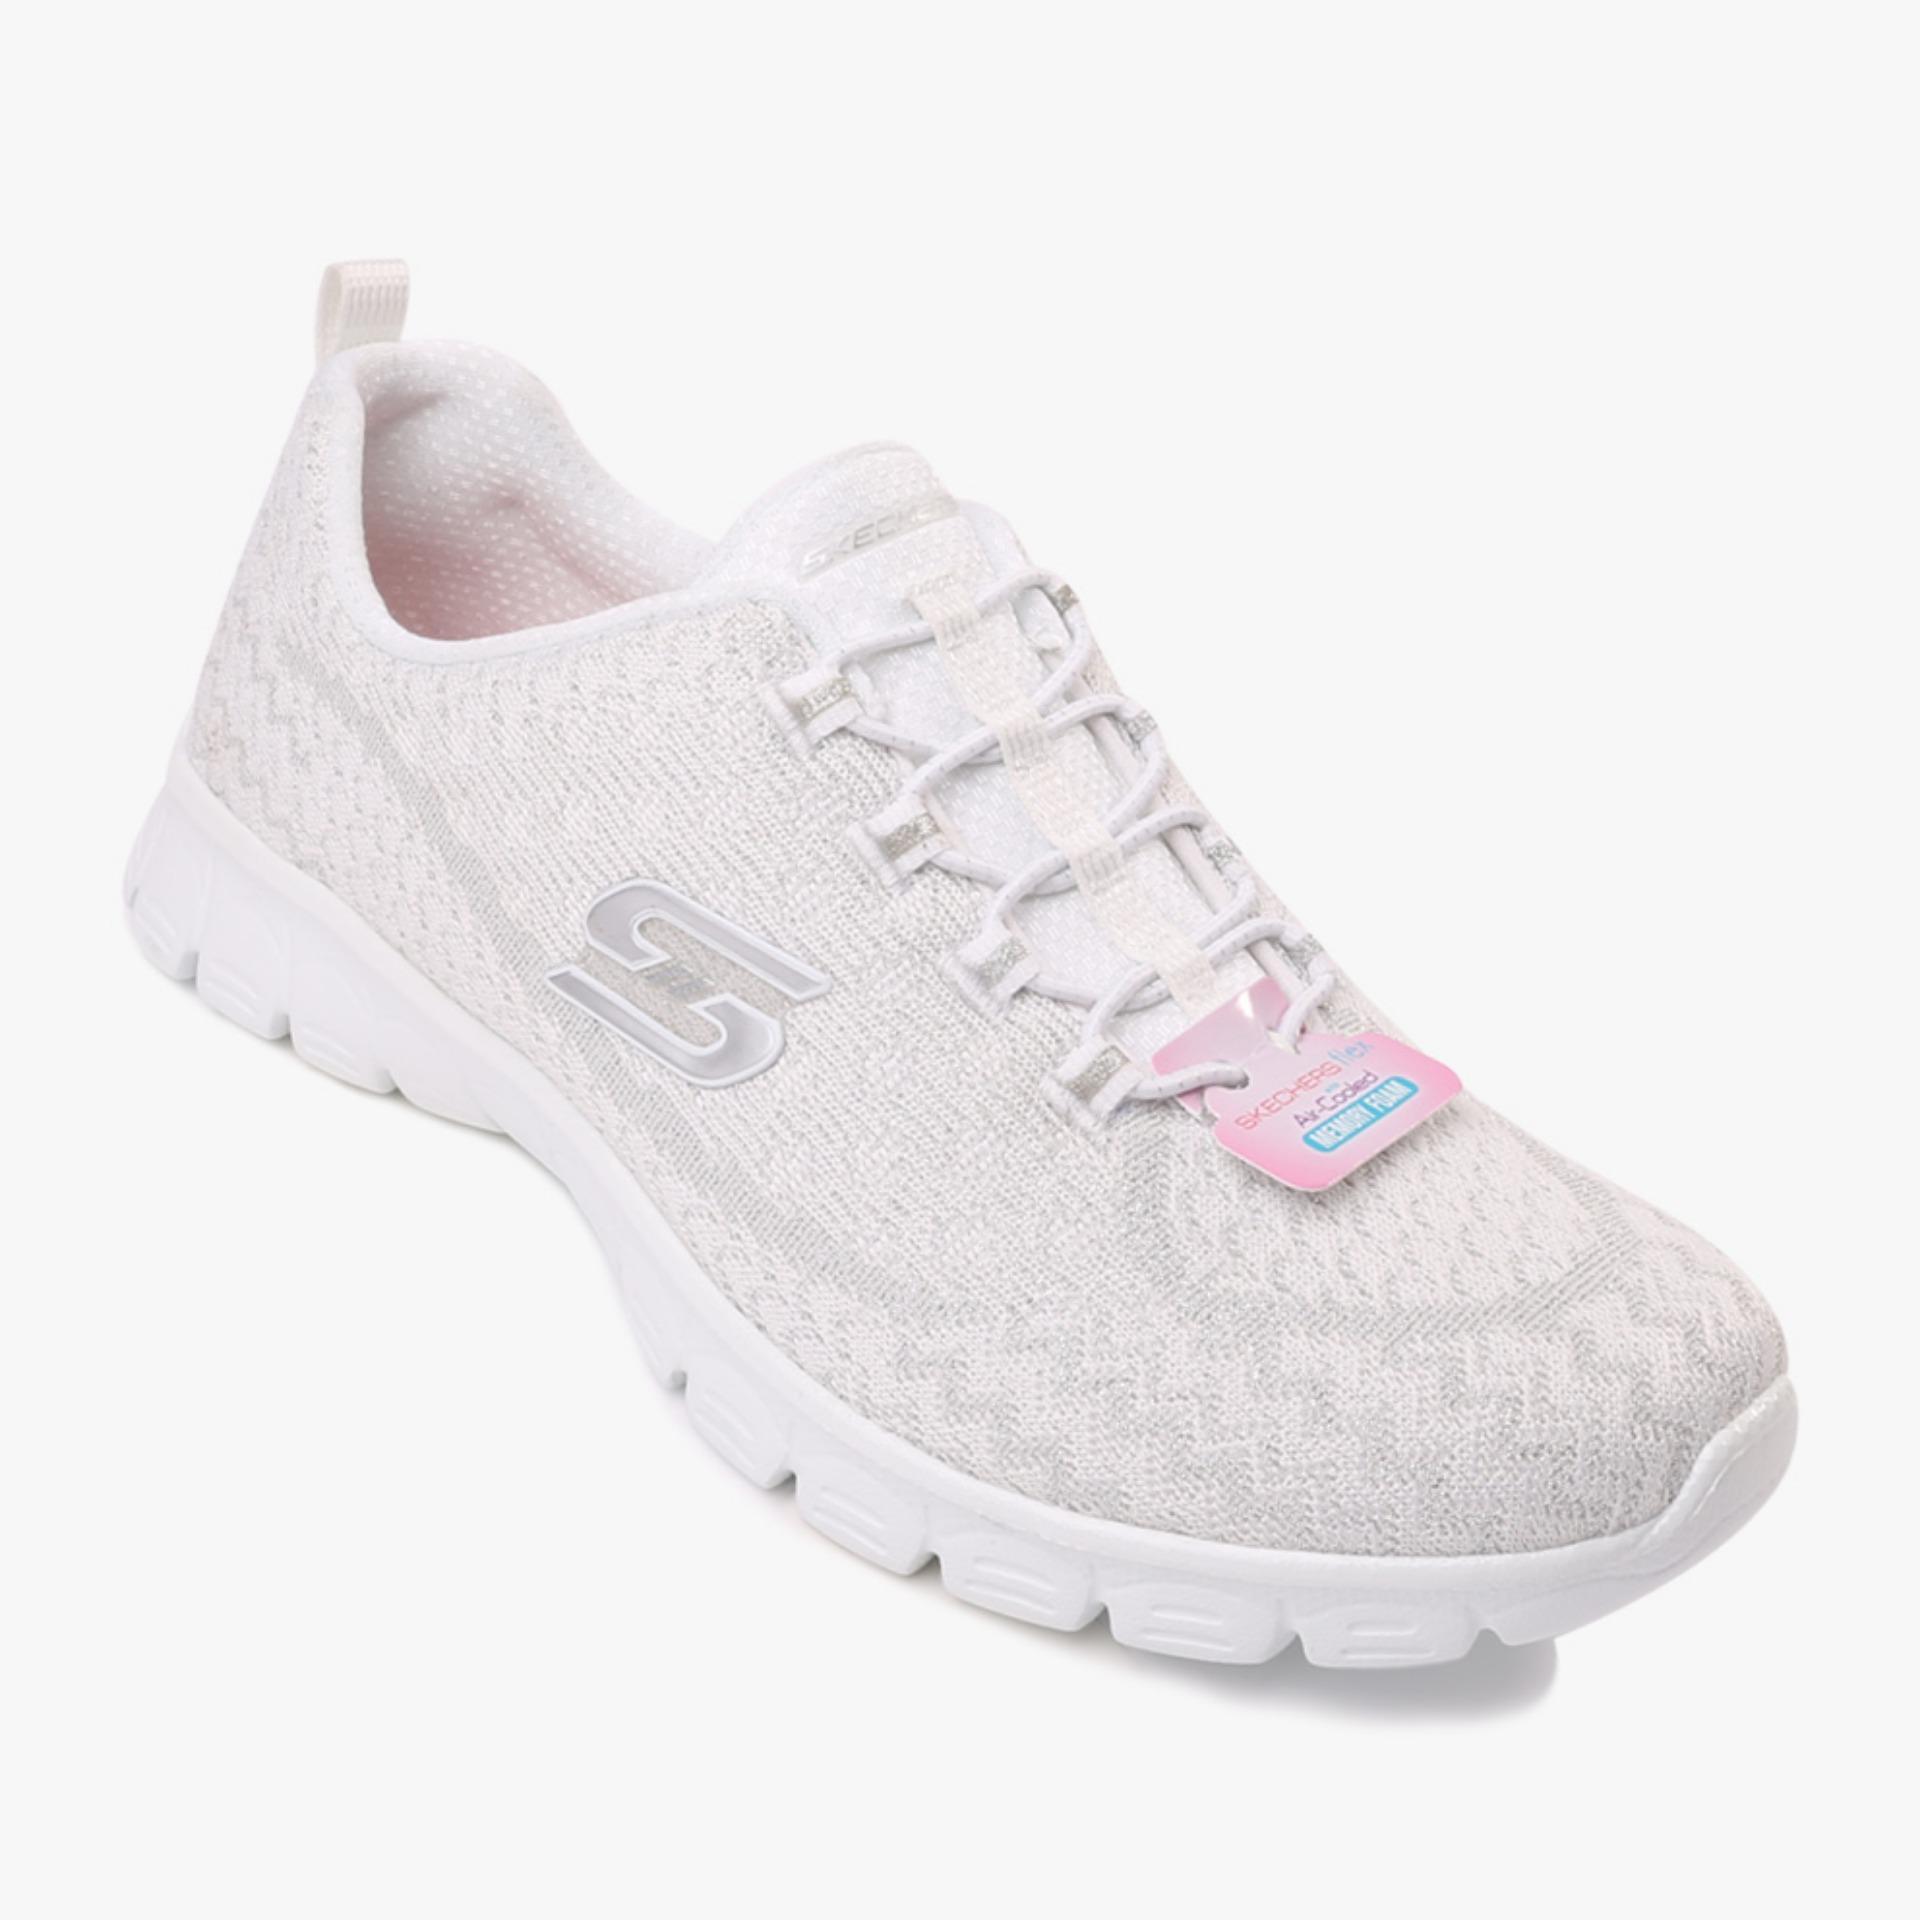 Promo Skechers Ez Flex 3 Estrella Women S Sneakers Putih Di Indonesia